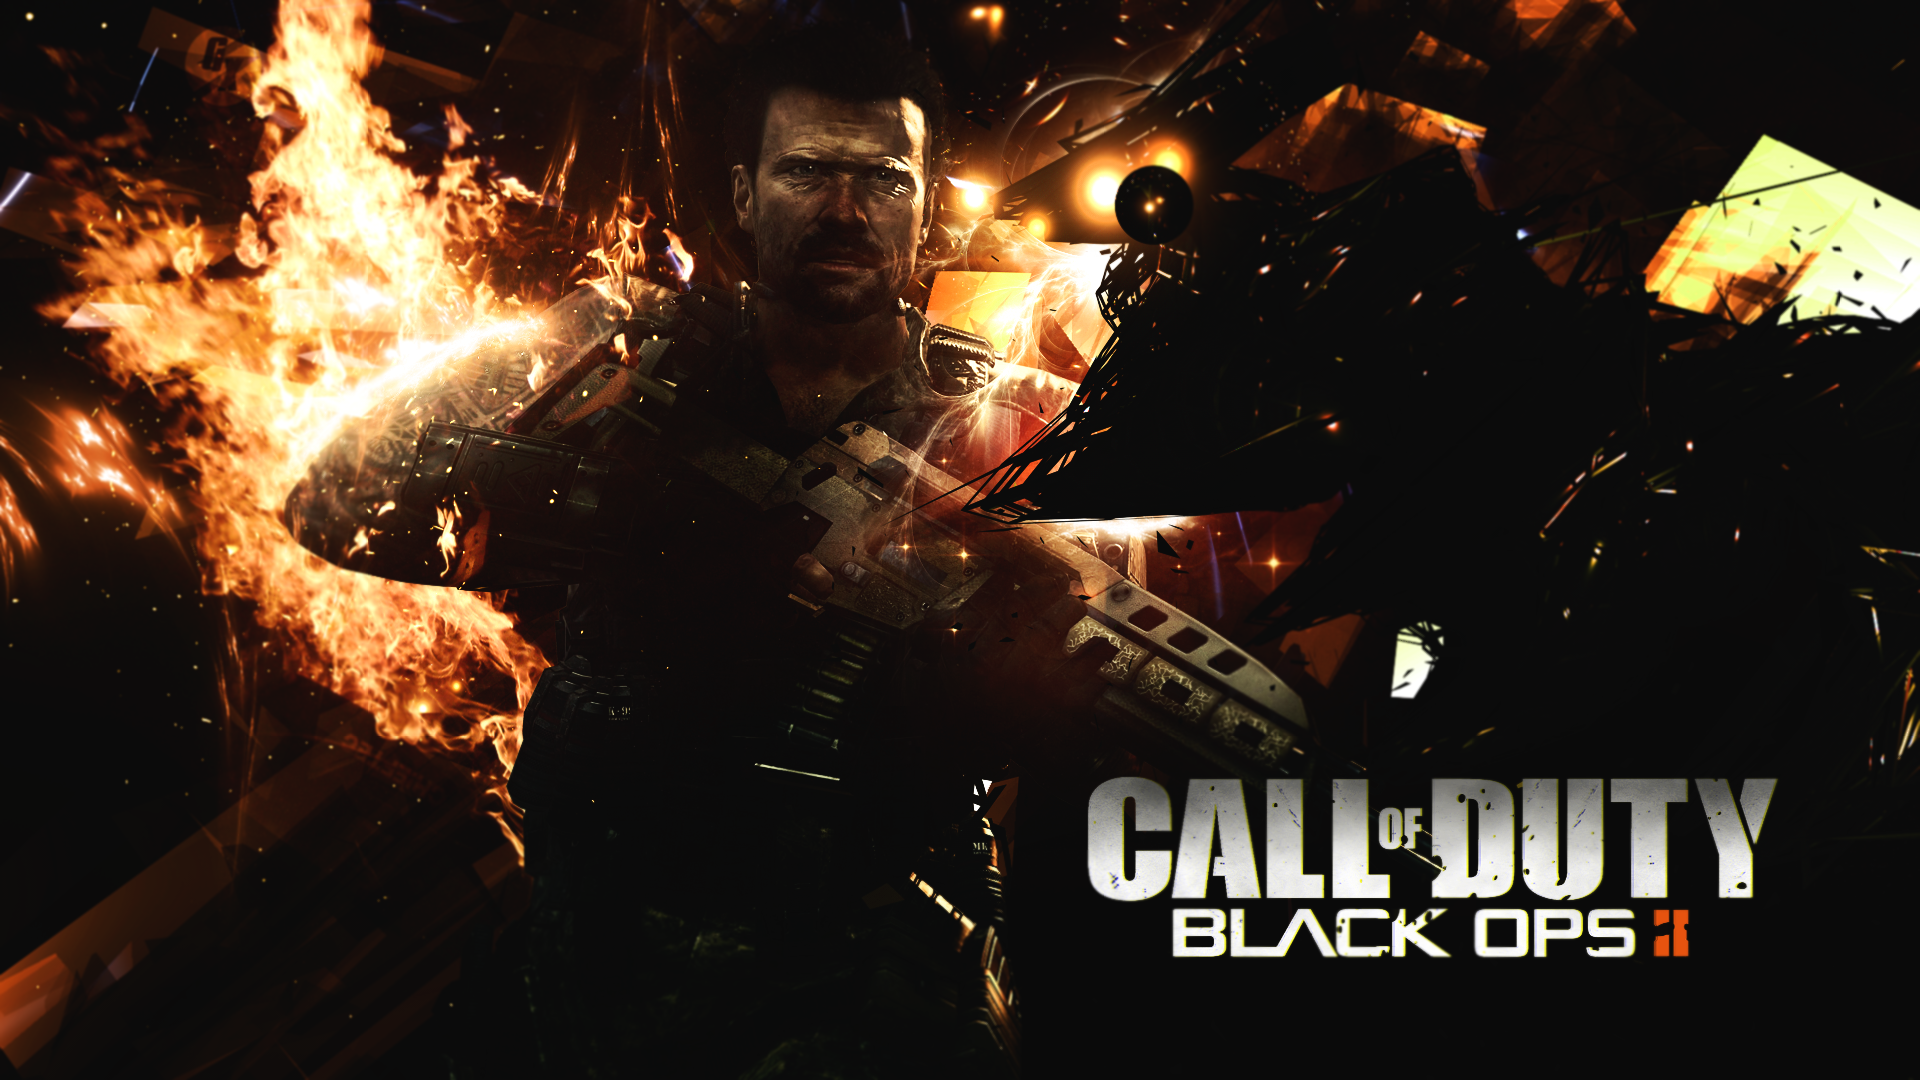 Black Ops 3 Wallpaper Hd 1080p 1080p Images